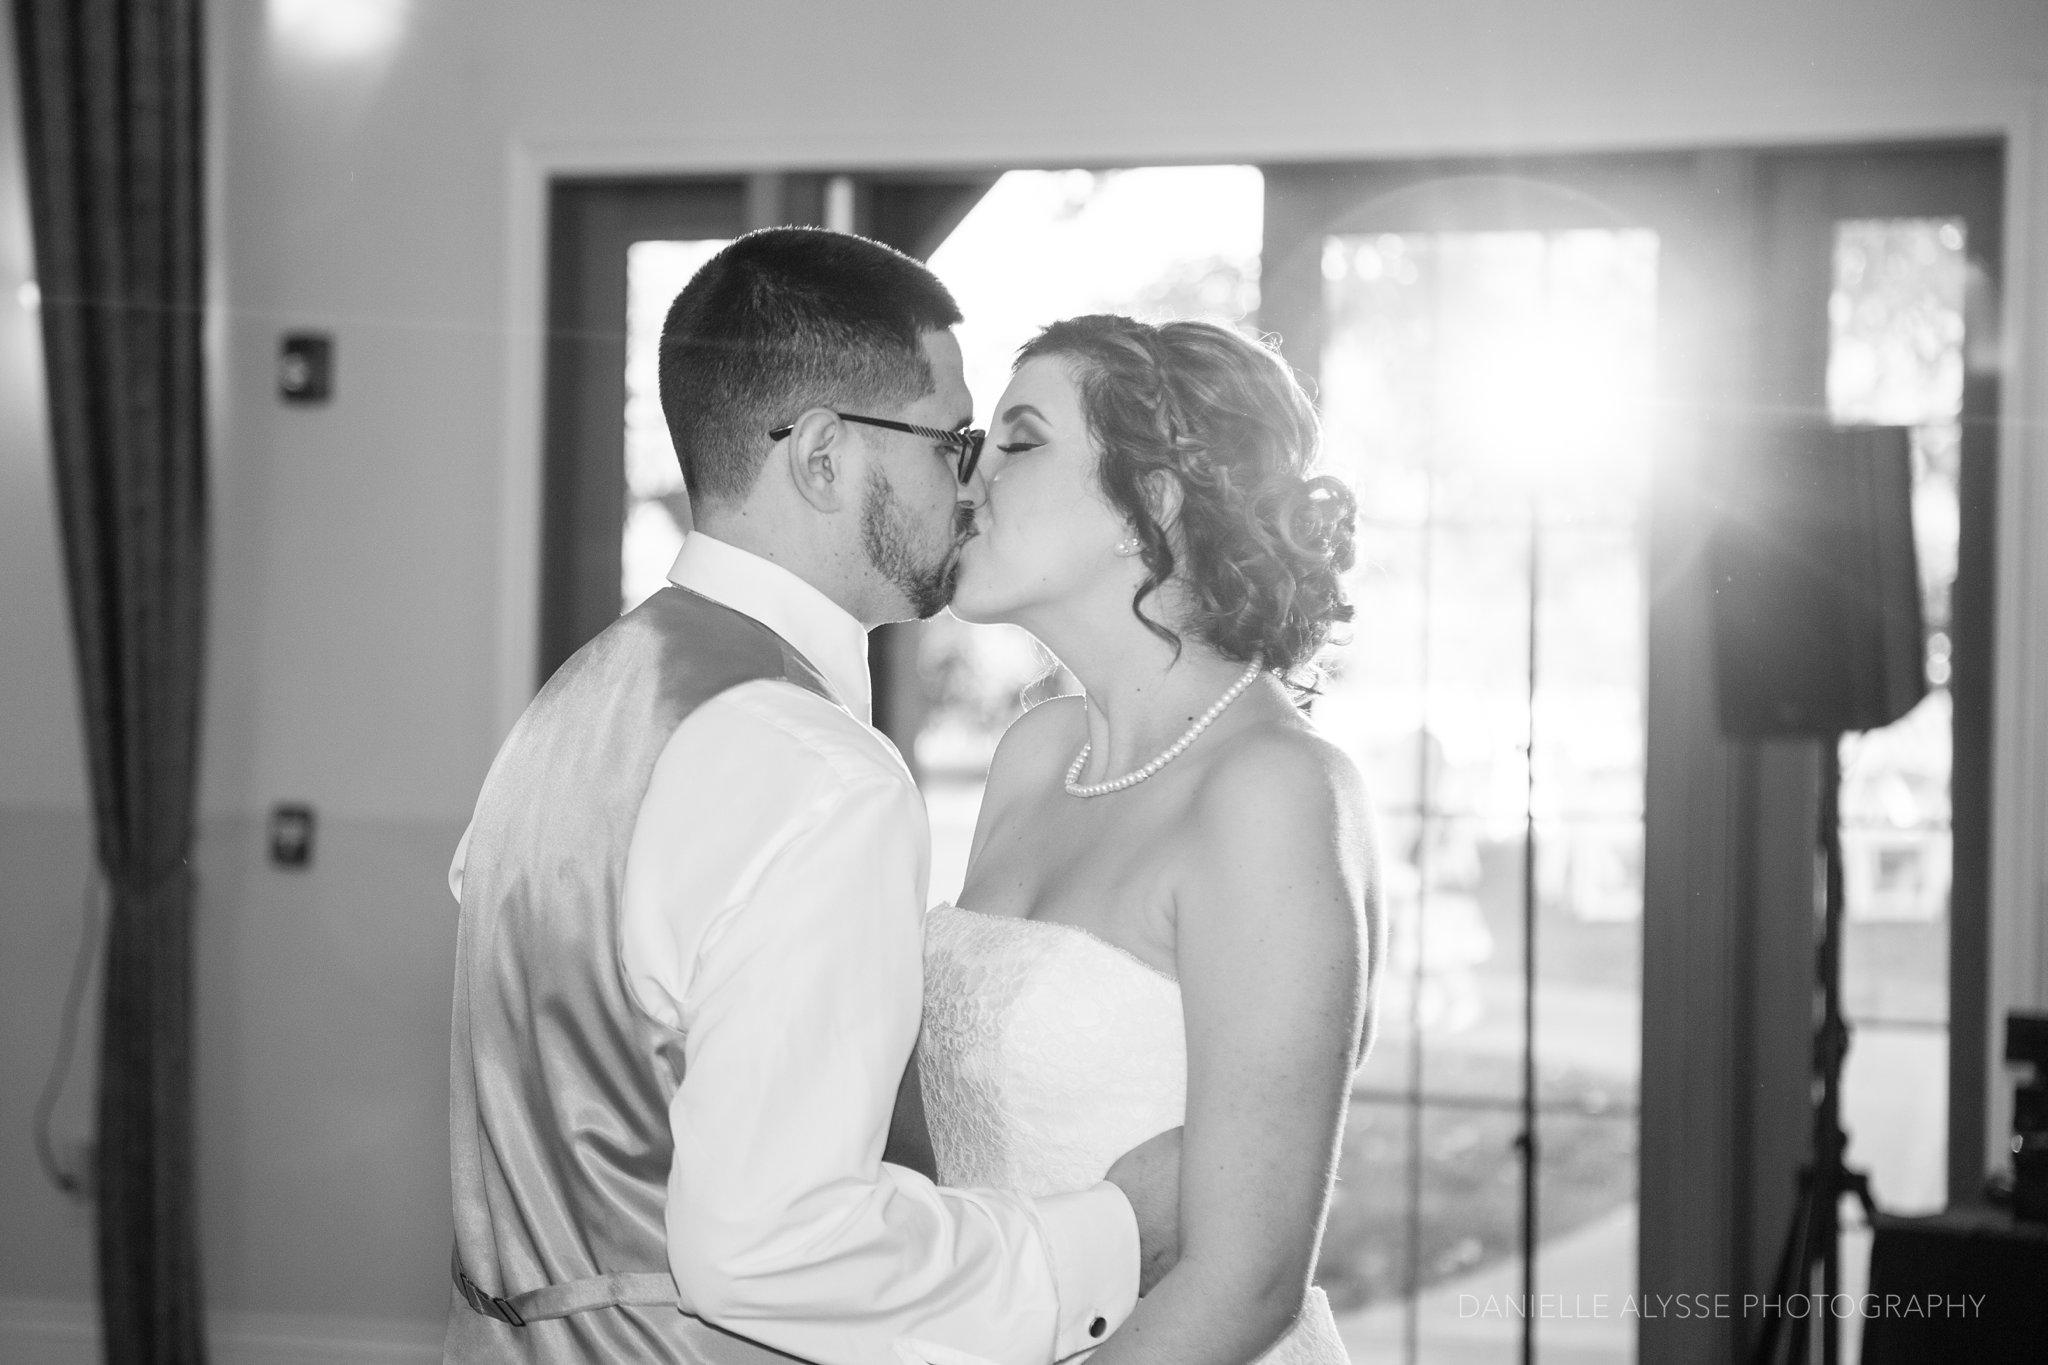 170507_blog_megan_david_wedding_loomis_flower_farm_inn_danielle_alysse_photography_sacramento_photographer0456_WEB.jpg